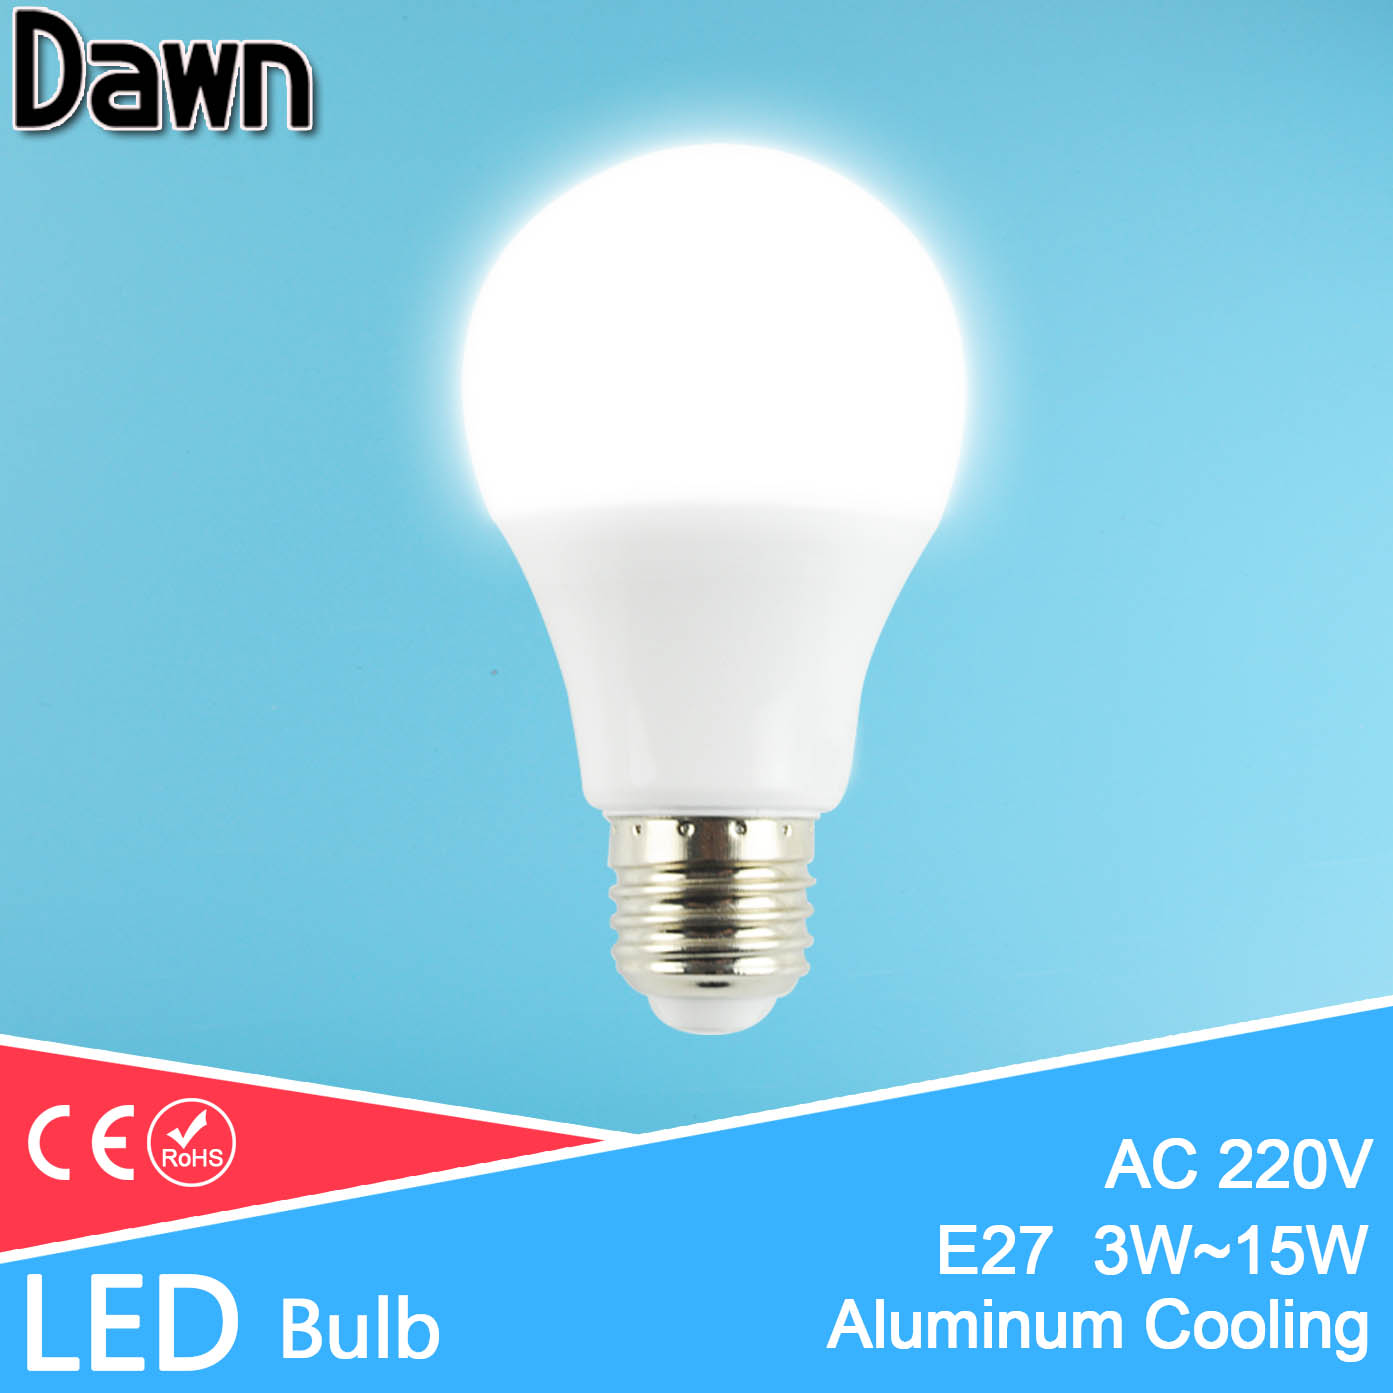 High Bright Aluminum & ABS LED Bulb E27 Lamp Light 3W 5W 7W 9W 12W 15W 220V 240V SMD 2835 Lamparas Bombillas Zarovka Ampoule LED led bulb light ampoule led bombillas 12v smd 5730 chip lampada luz lamp 3w 5w 9w 10w 12w spot bulb portable filament luminaria